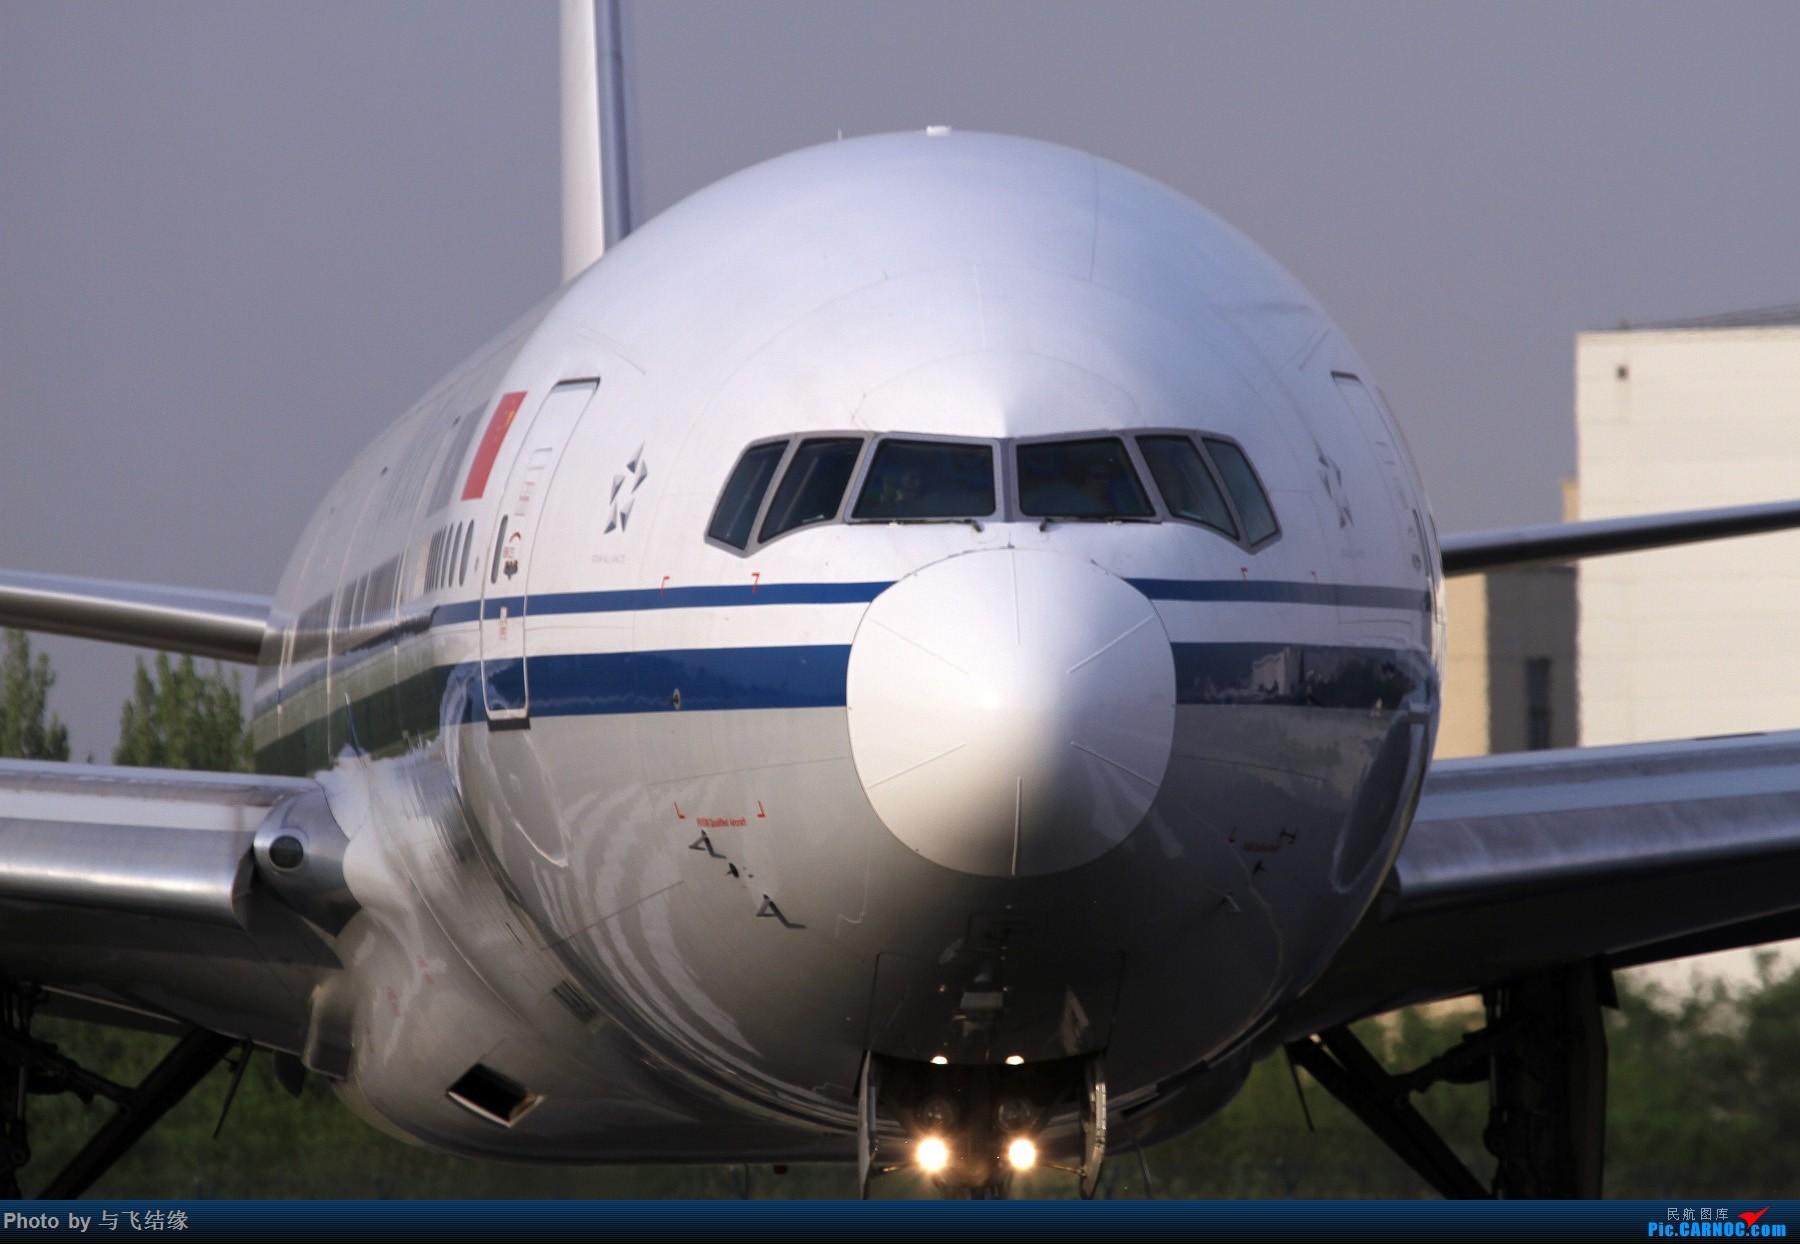 Re:[原创]中国国际航空公司Boeing 777-300ER,B-2043特写组照! BOEING 777-300ER B-2043 中国北京首都国际机场